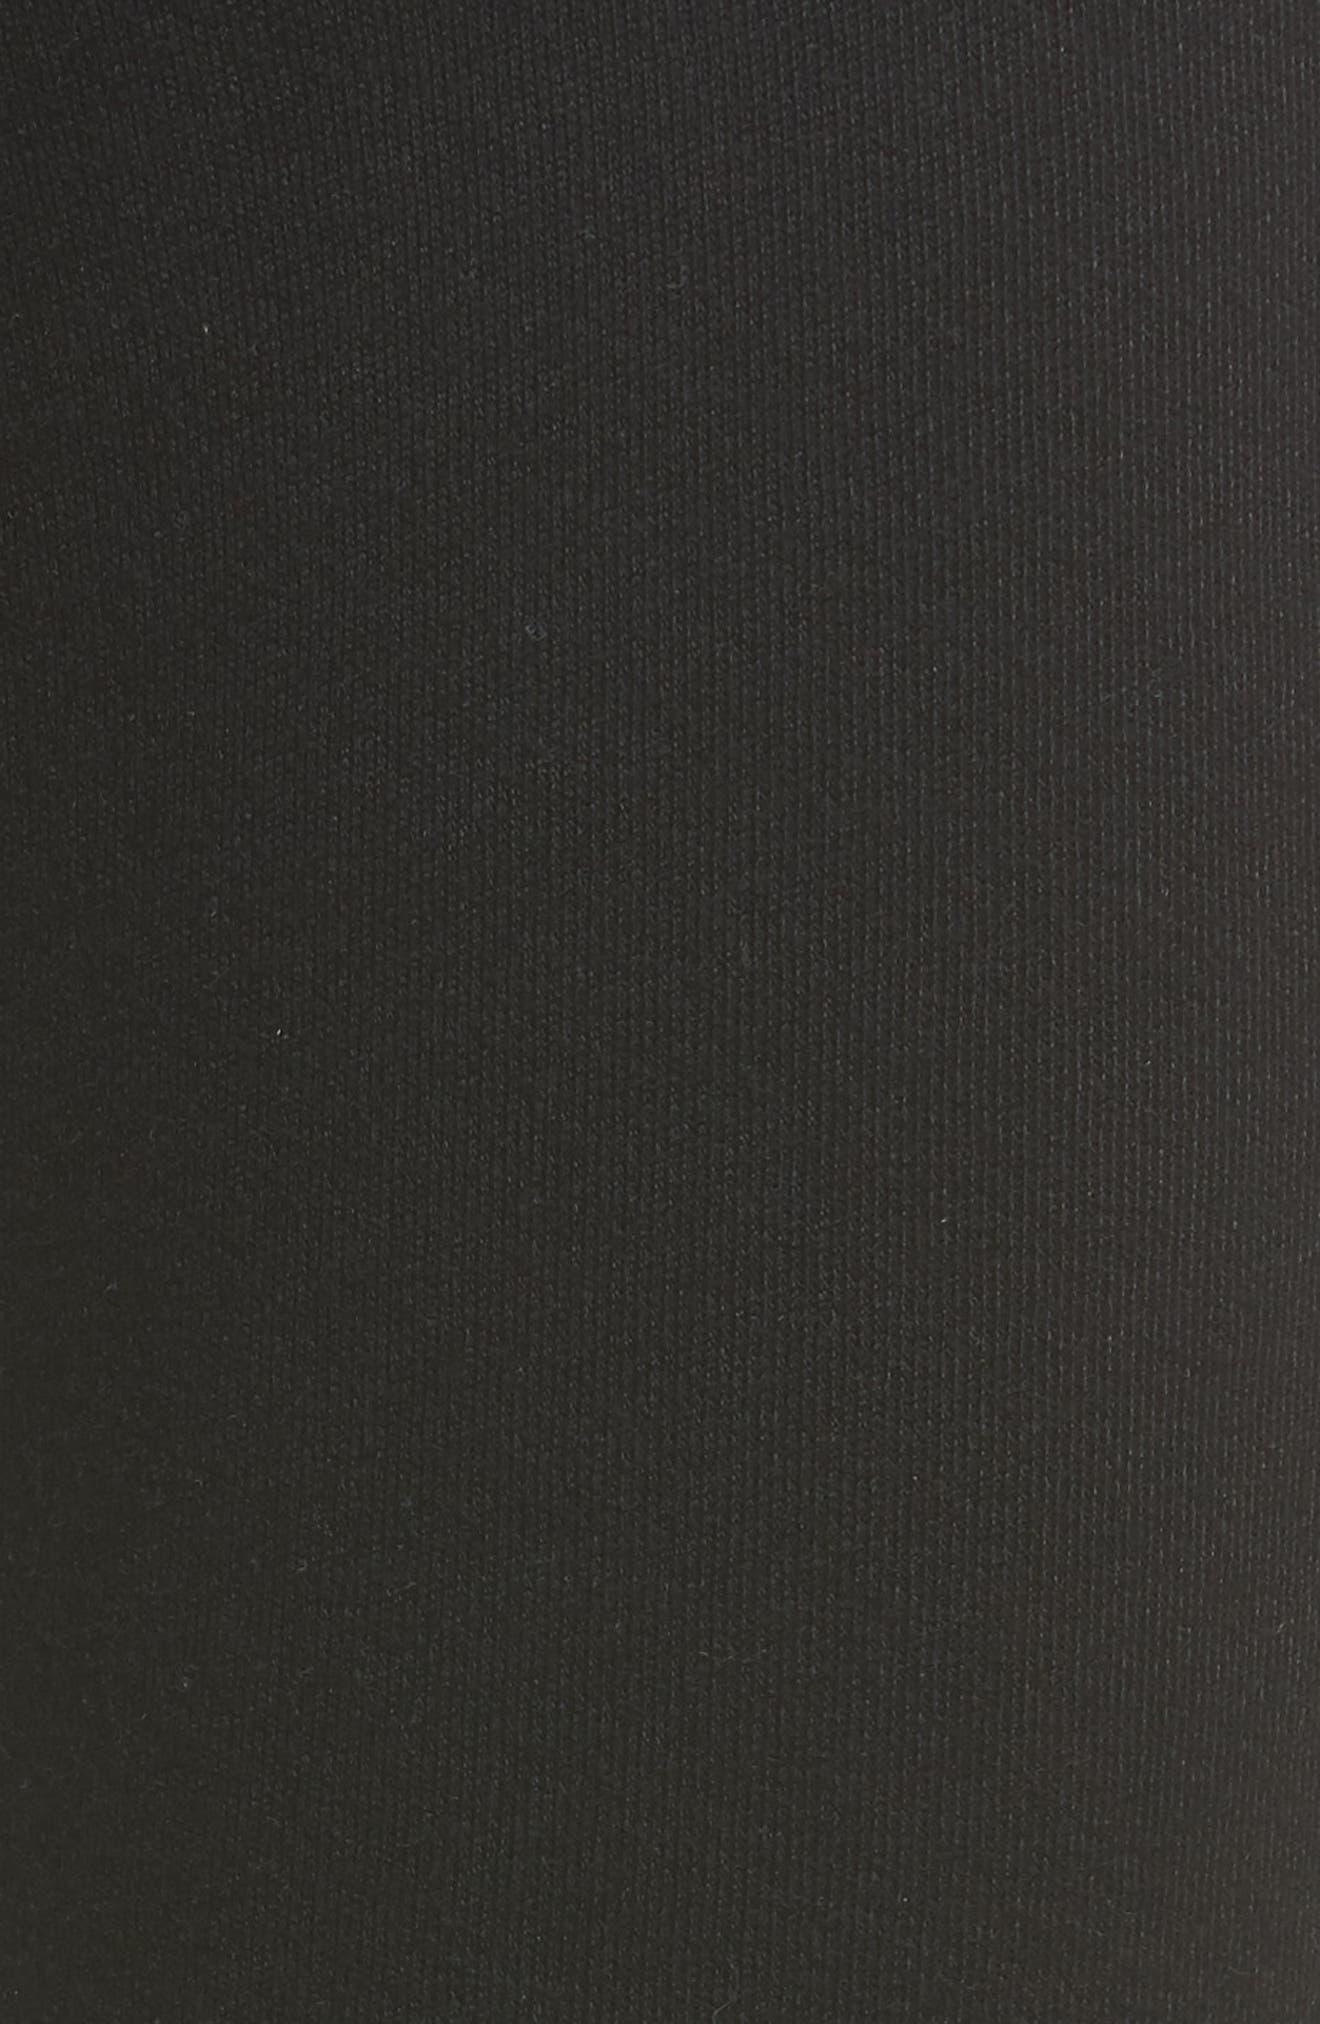 Ruthie Shredded Jogger Pants,                             Alternate thumbnail 5, color,                             001